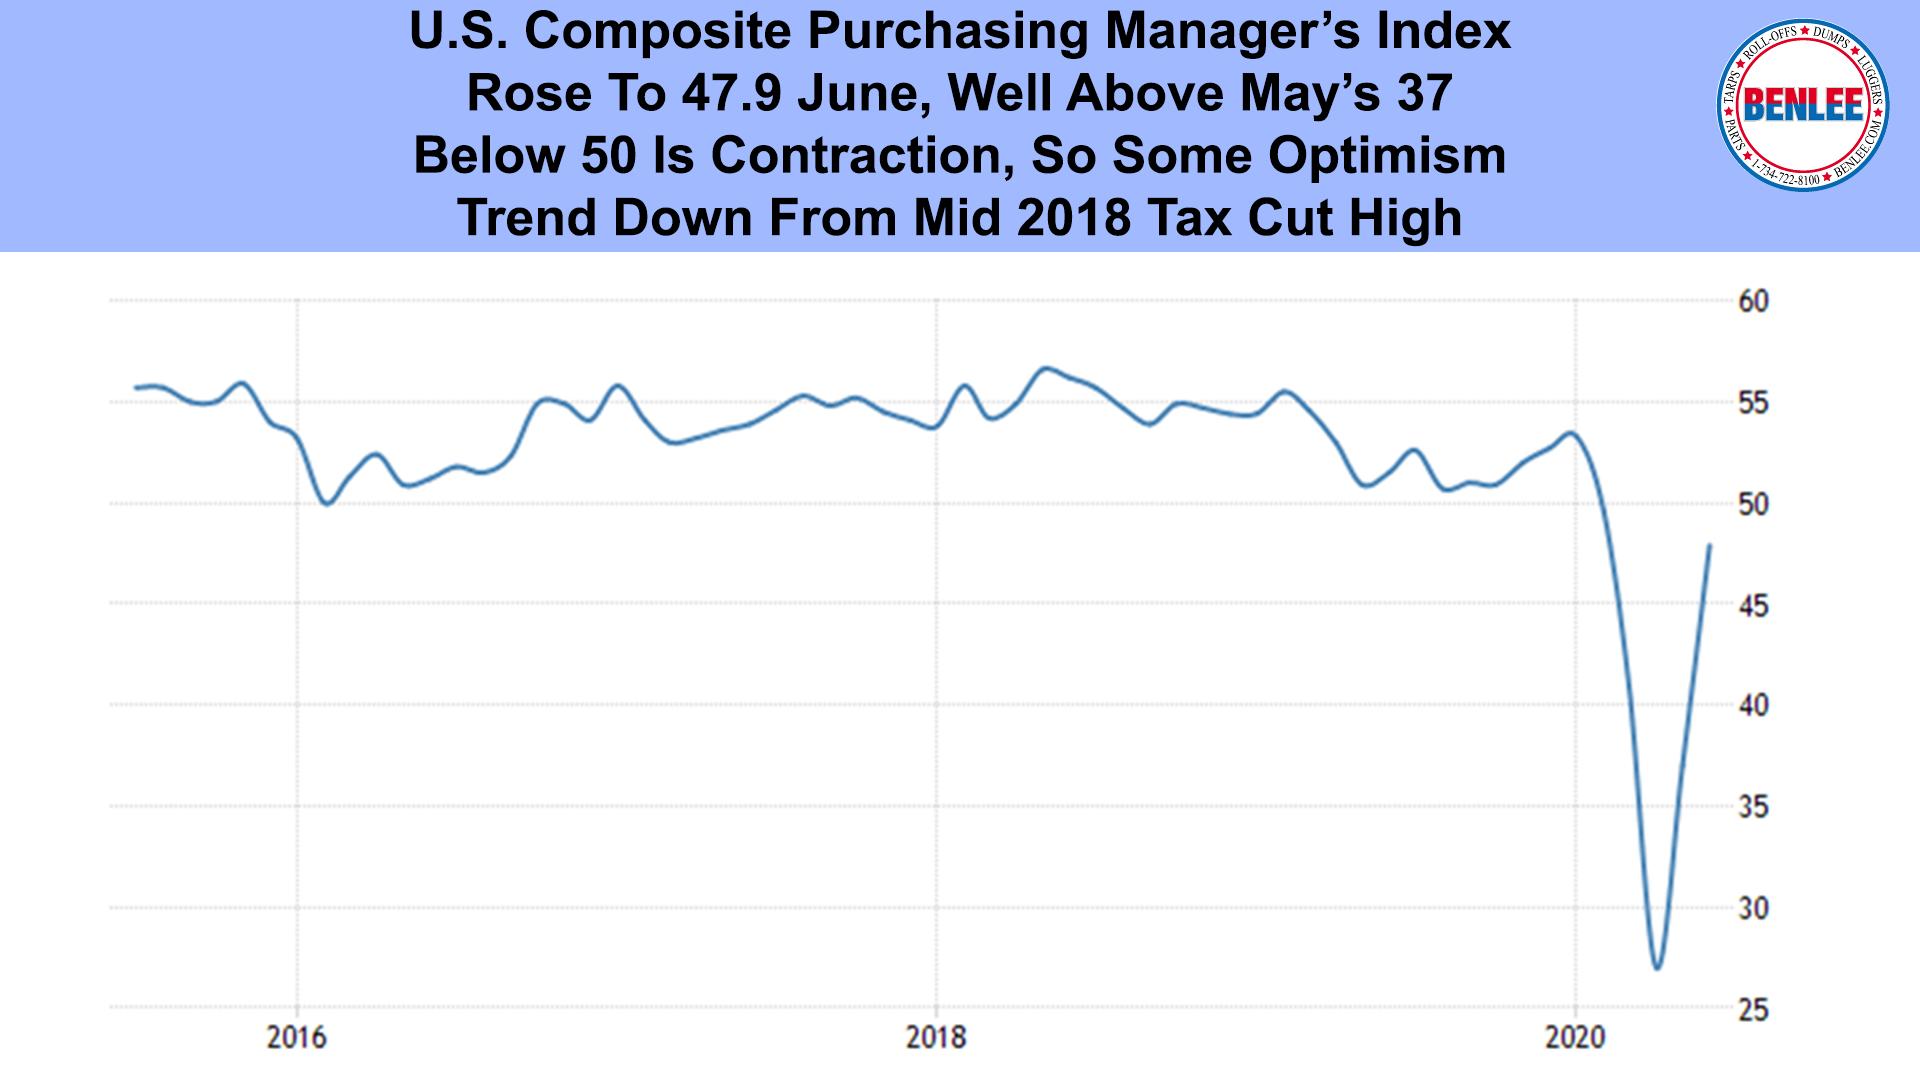 U.S. Composite Purchasing Manager's Index